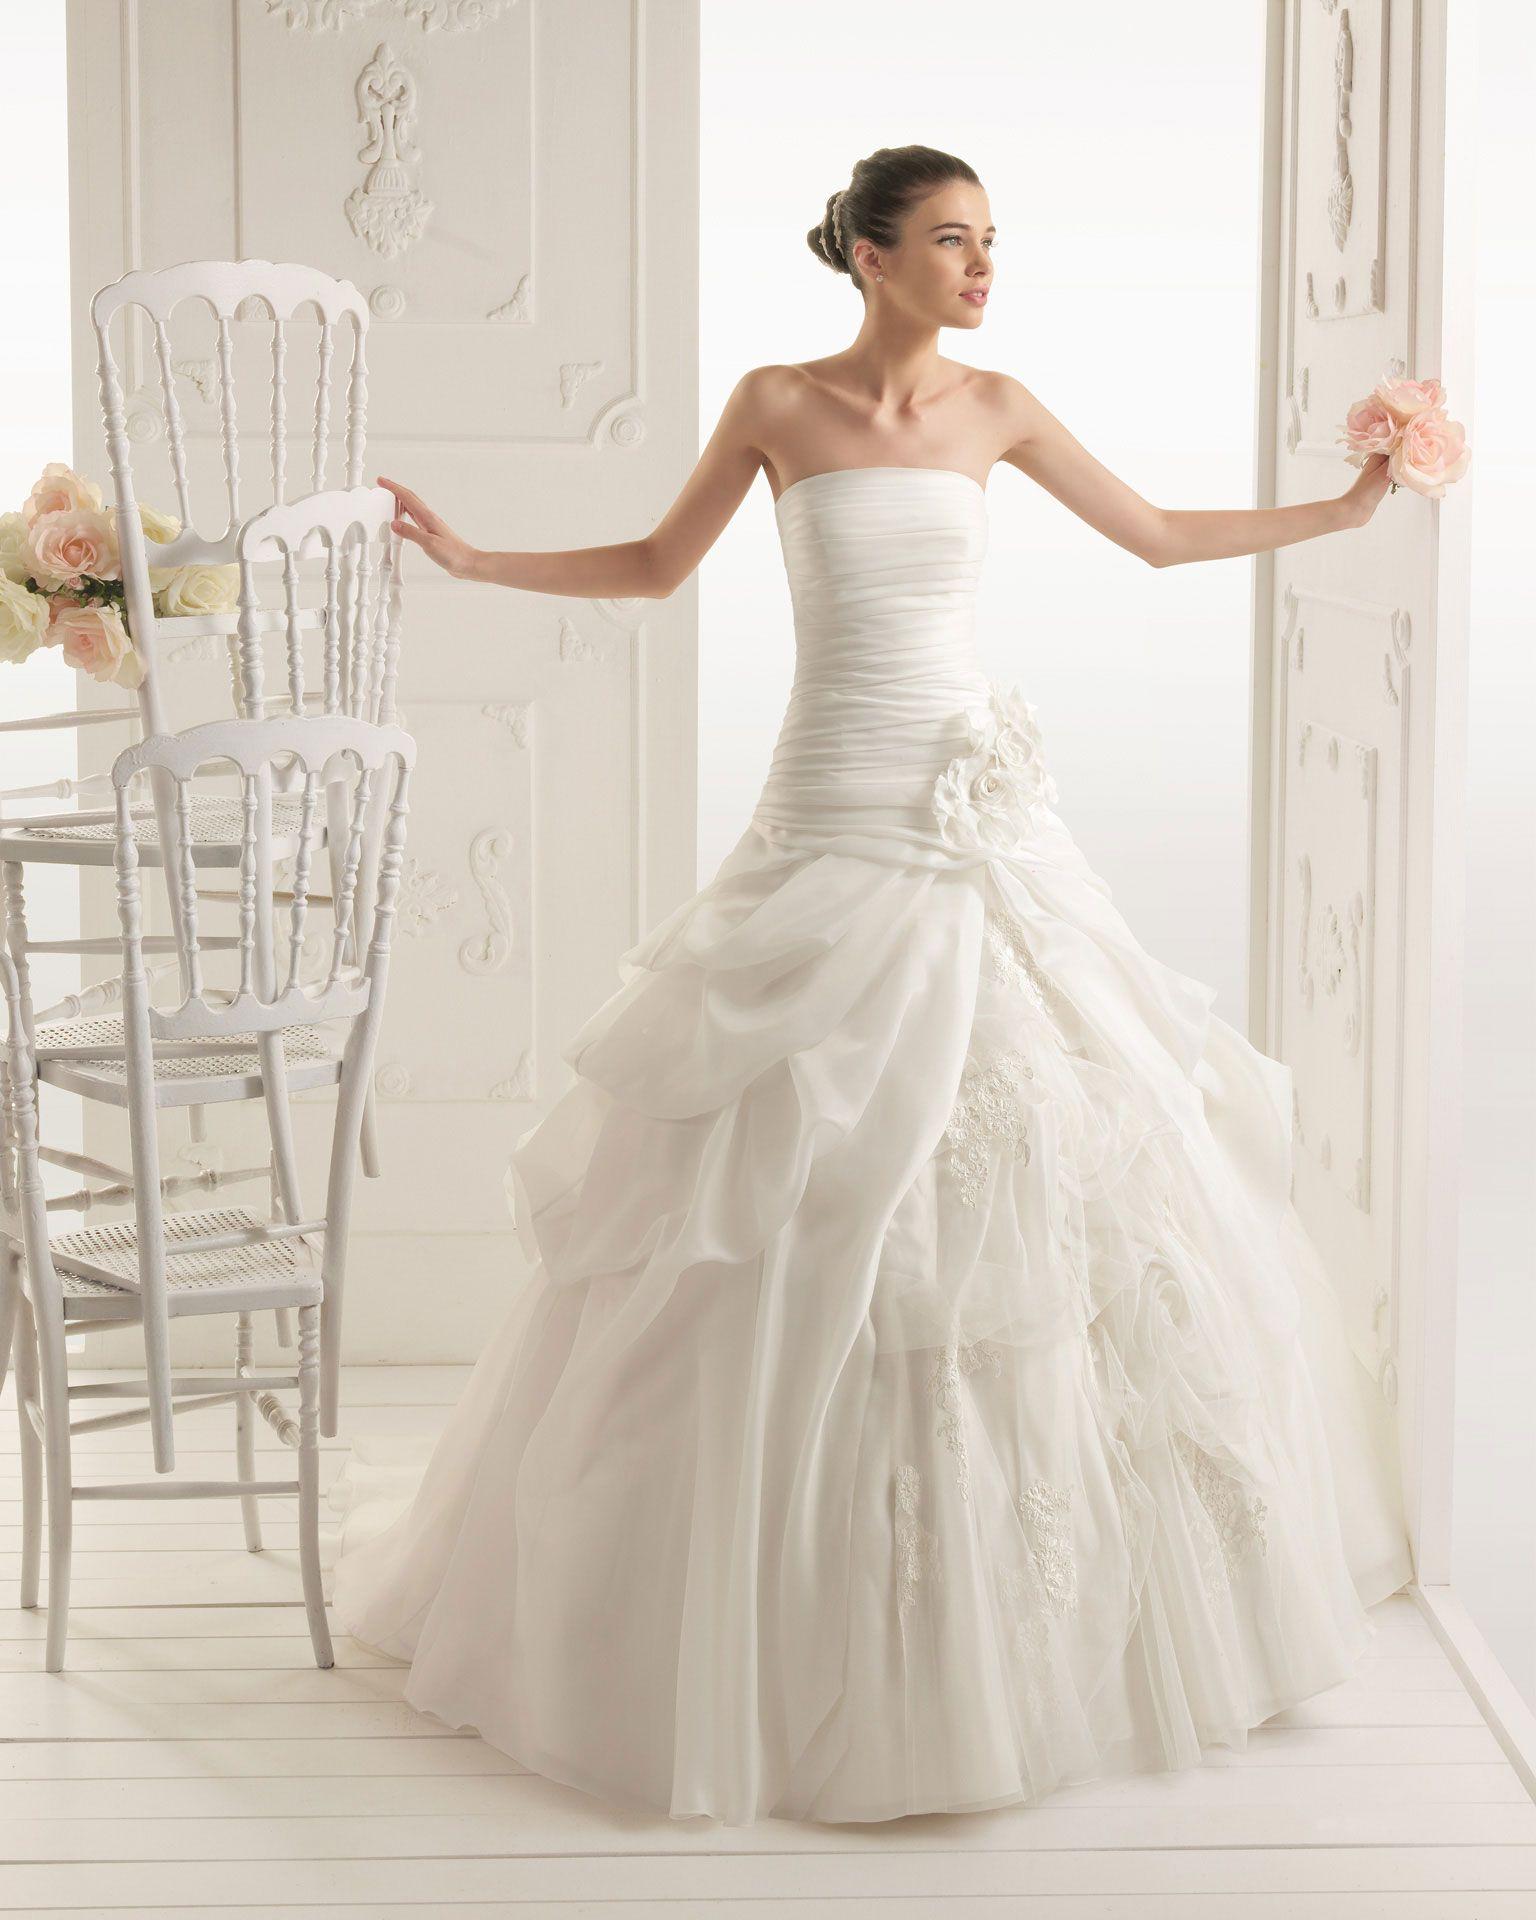 Ecru wedding dress  RUMBA  Organza dress in ecru  All About Weddings  Pinterest